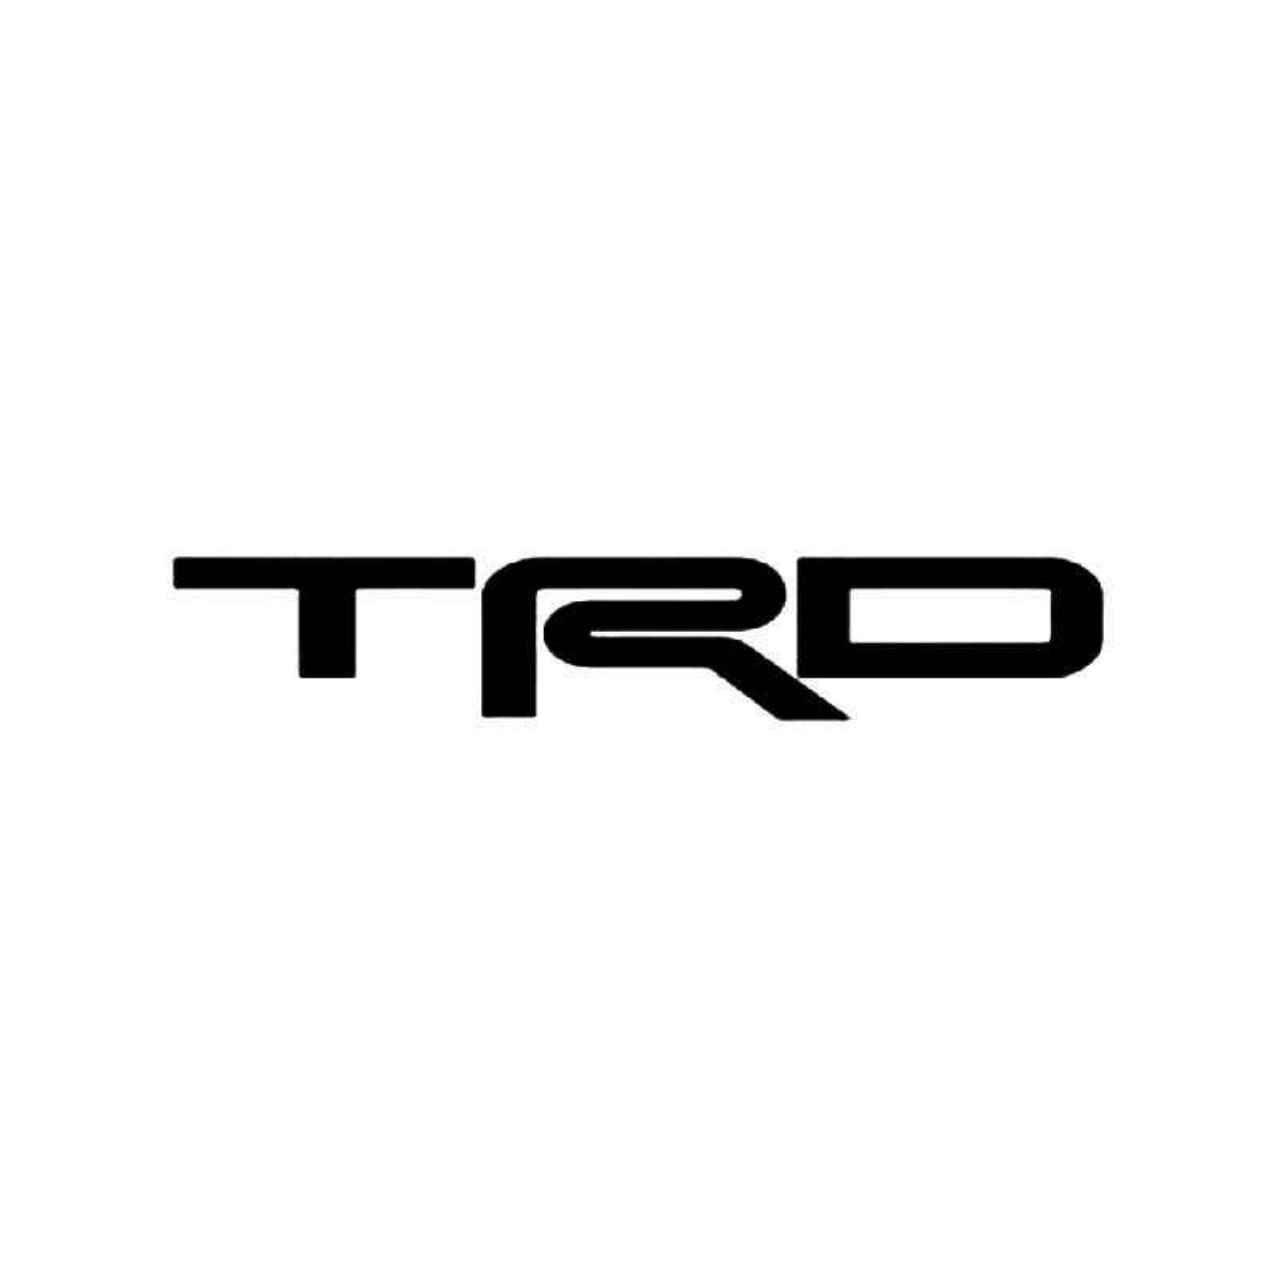 Trd Toyota Vinyl Decal Sticker